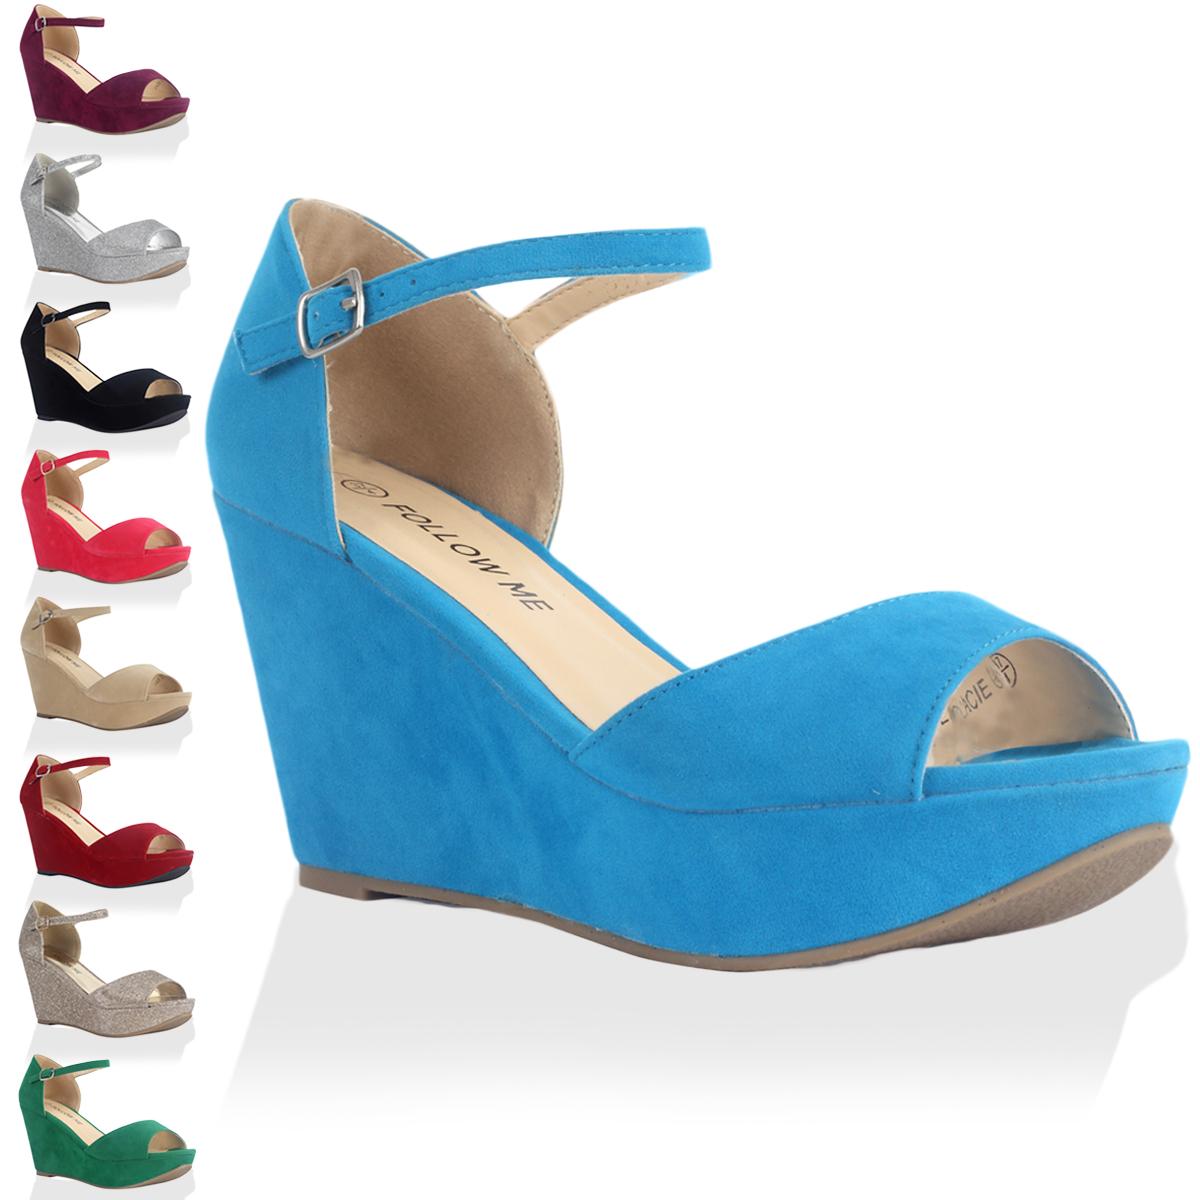 New Ladies Ankle Strap Womens Peep Toe Platform High Wedge Heel Shoes Size 4-9